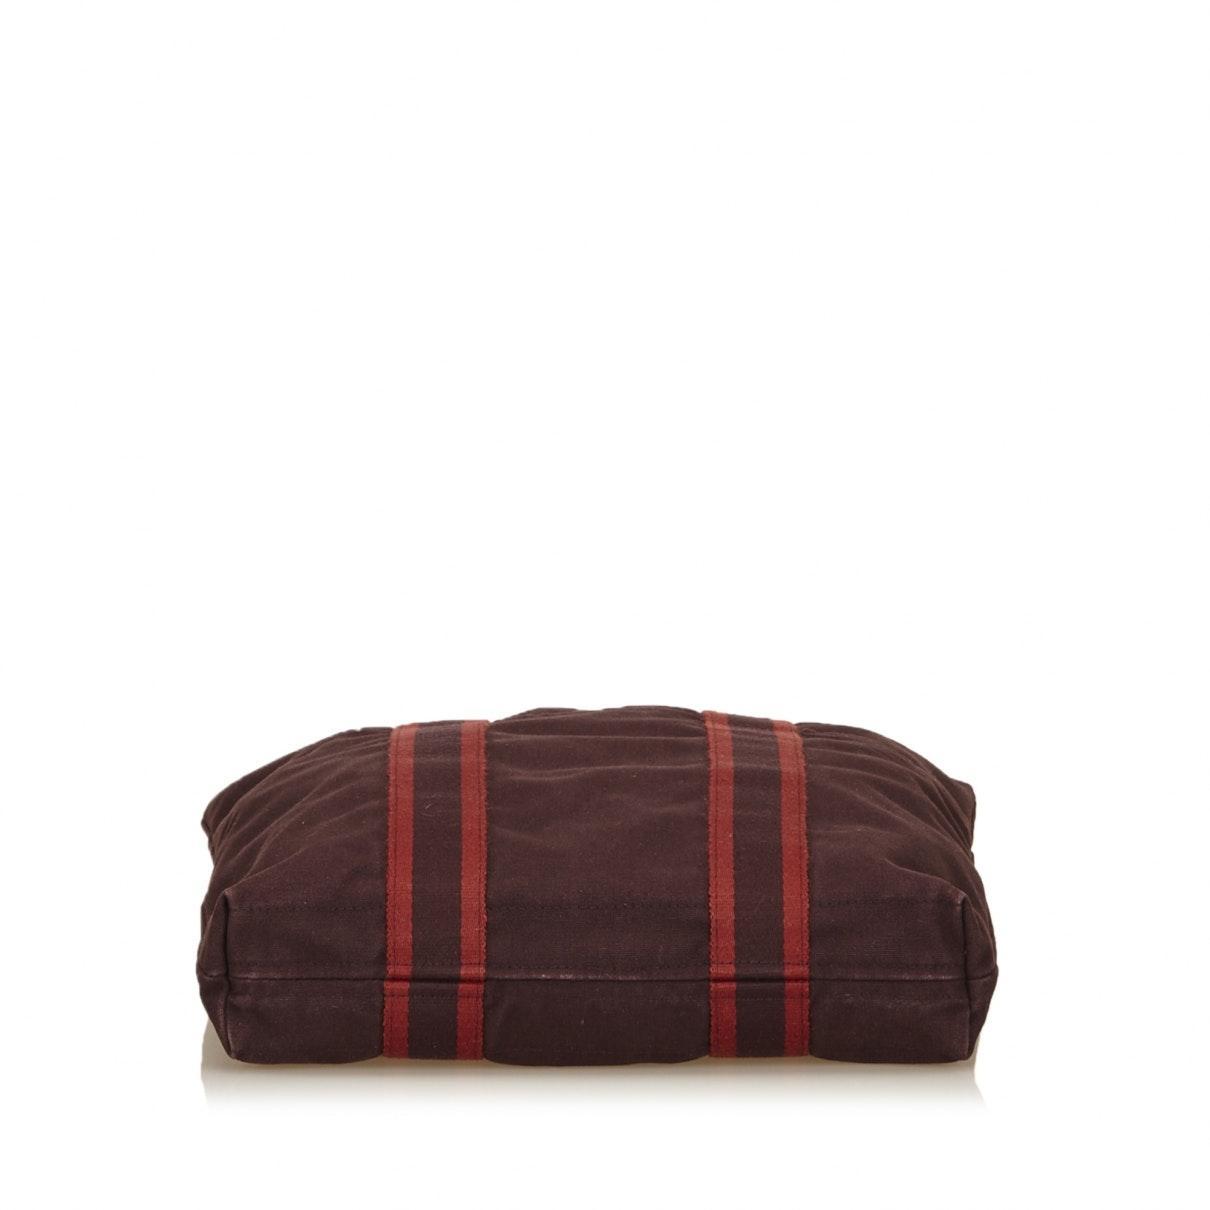 Hermès Canvas Toto Red Cloth